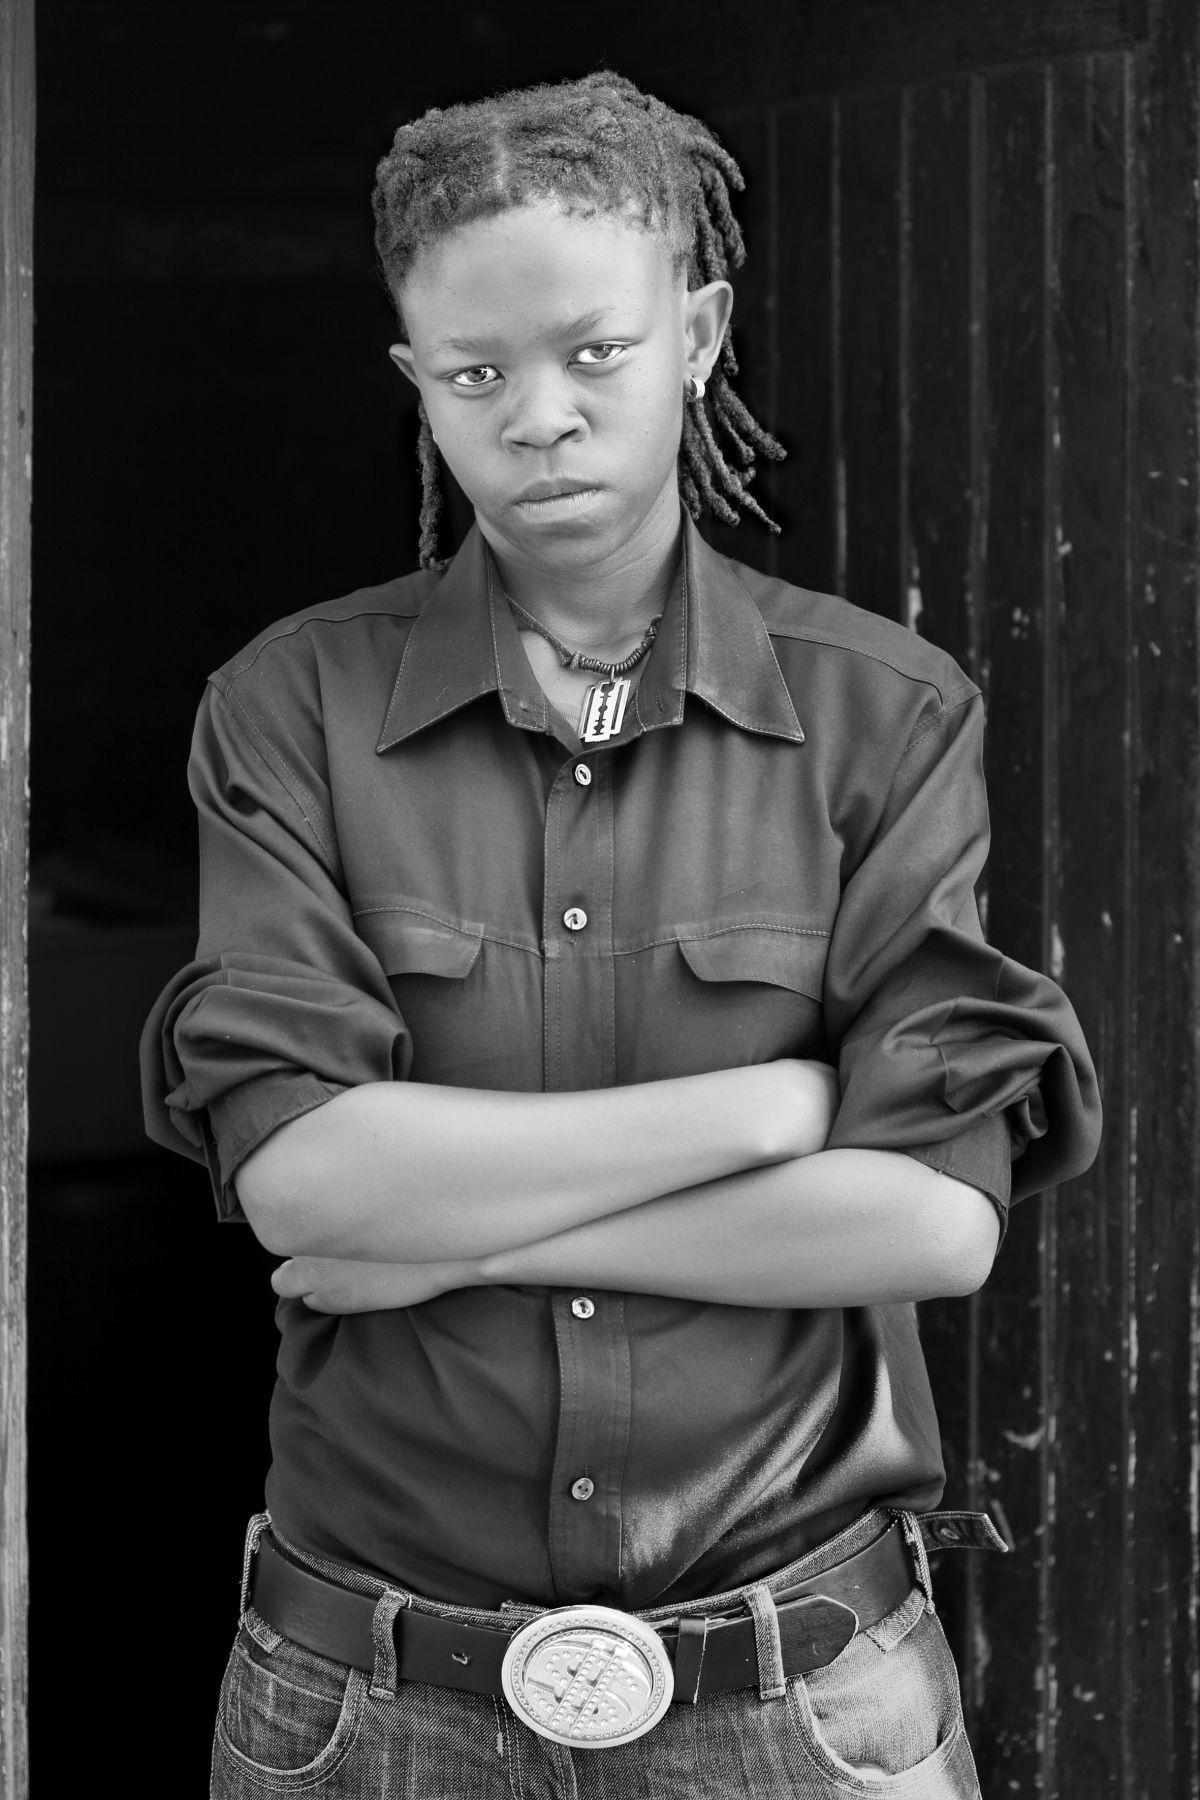 Bongiwe ''Twana' Kunene, Kwanele South, Katlehong, Johannesburg,2012, From the Series Faces and Phases.